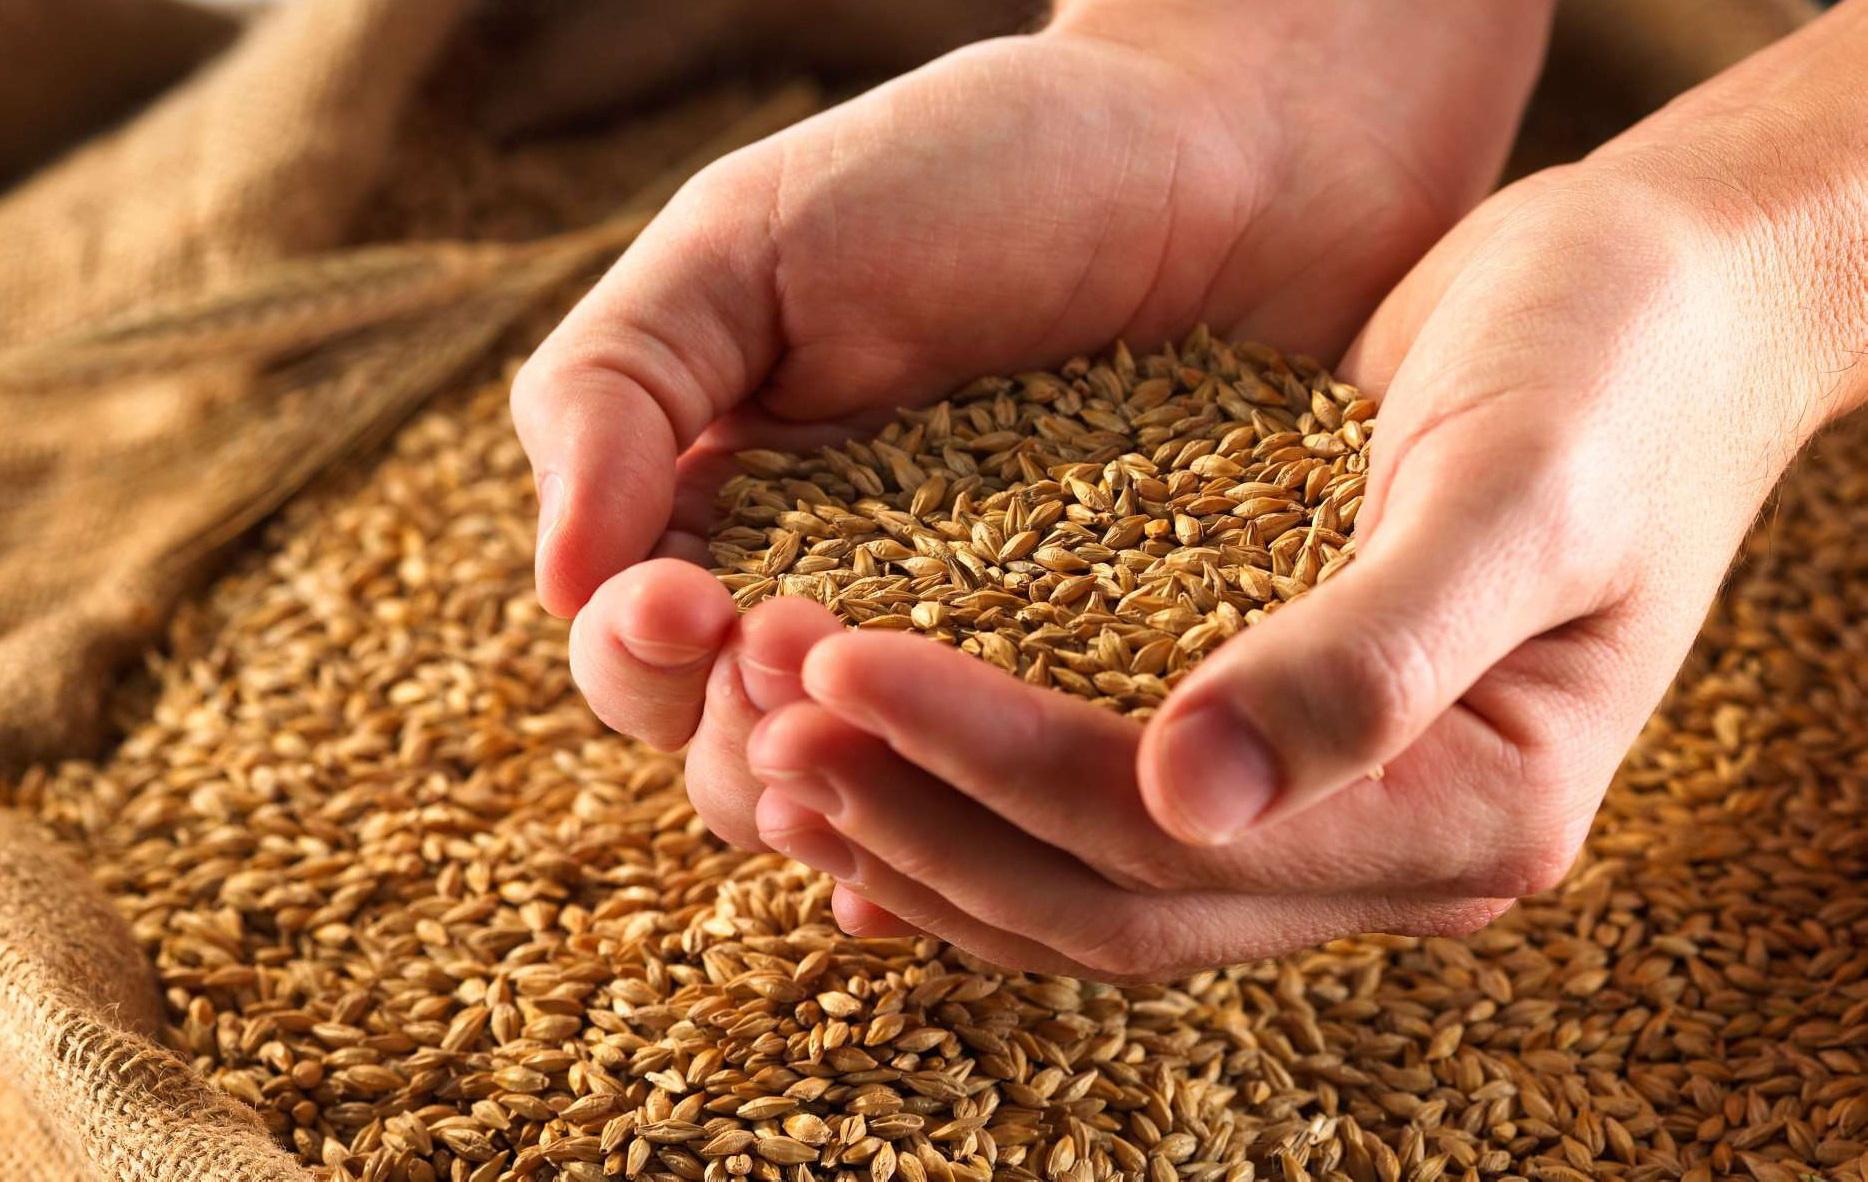 Казахстан собрал около 14 млн тонн зерна , Казахстан, зерно, экспорт, МСХ РК